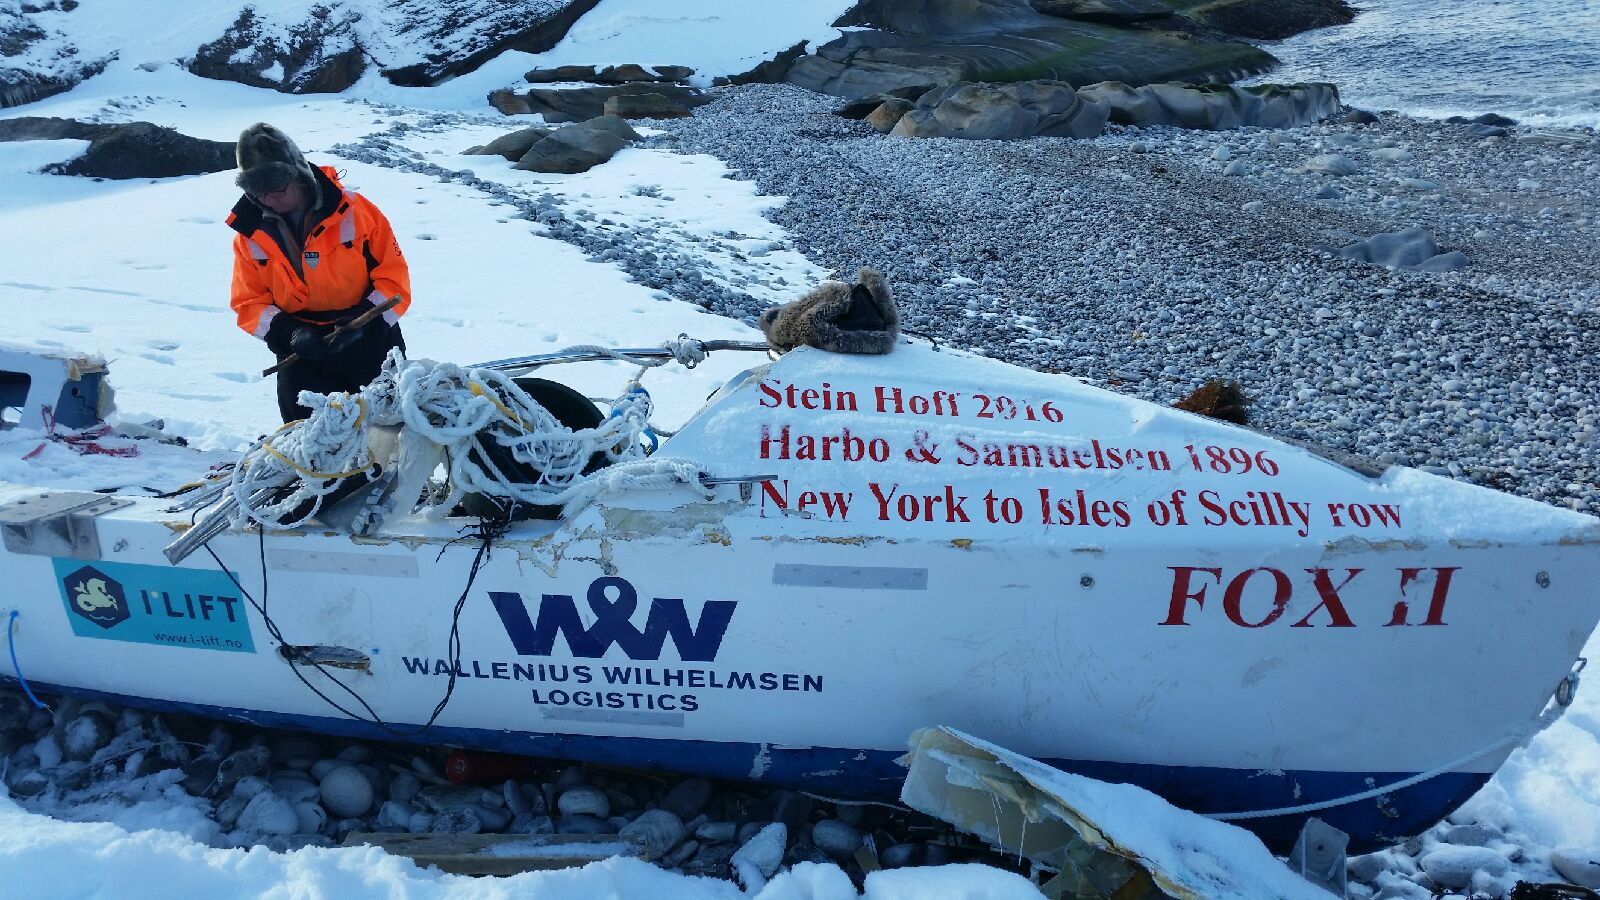 the shipwrecked fox ii